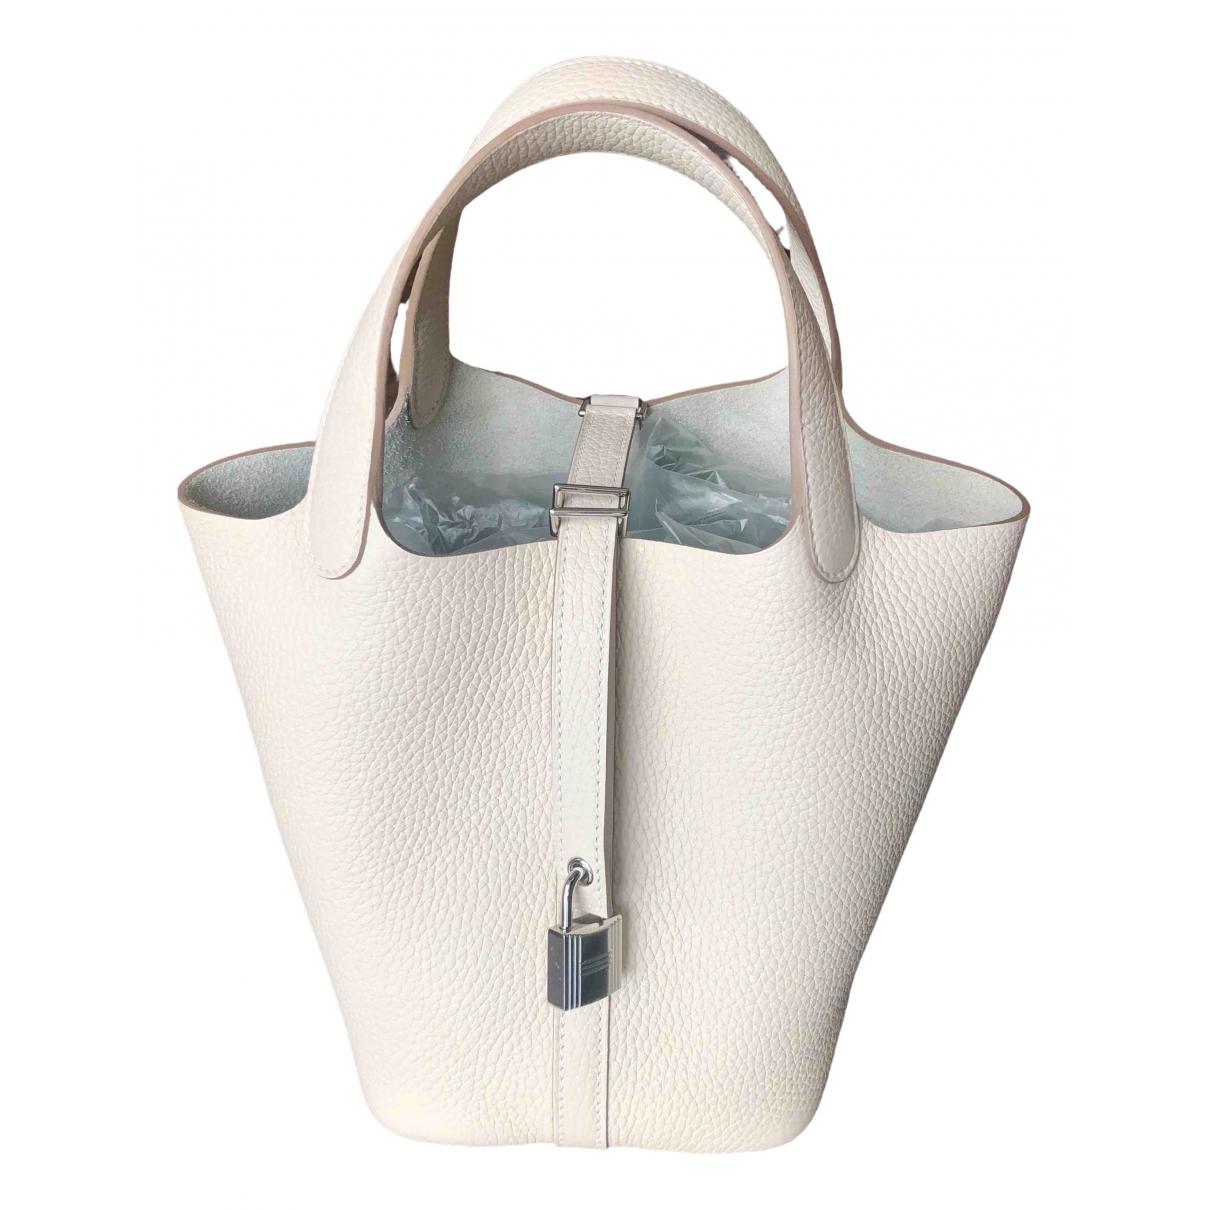 Hermès Picotin White Leather handbag for Women \N